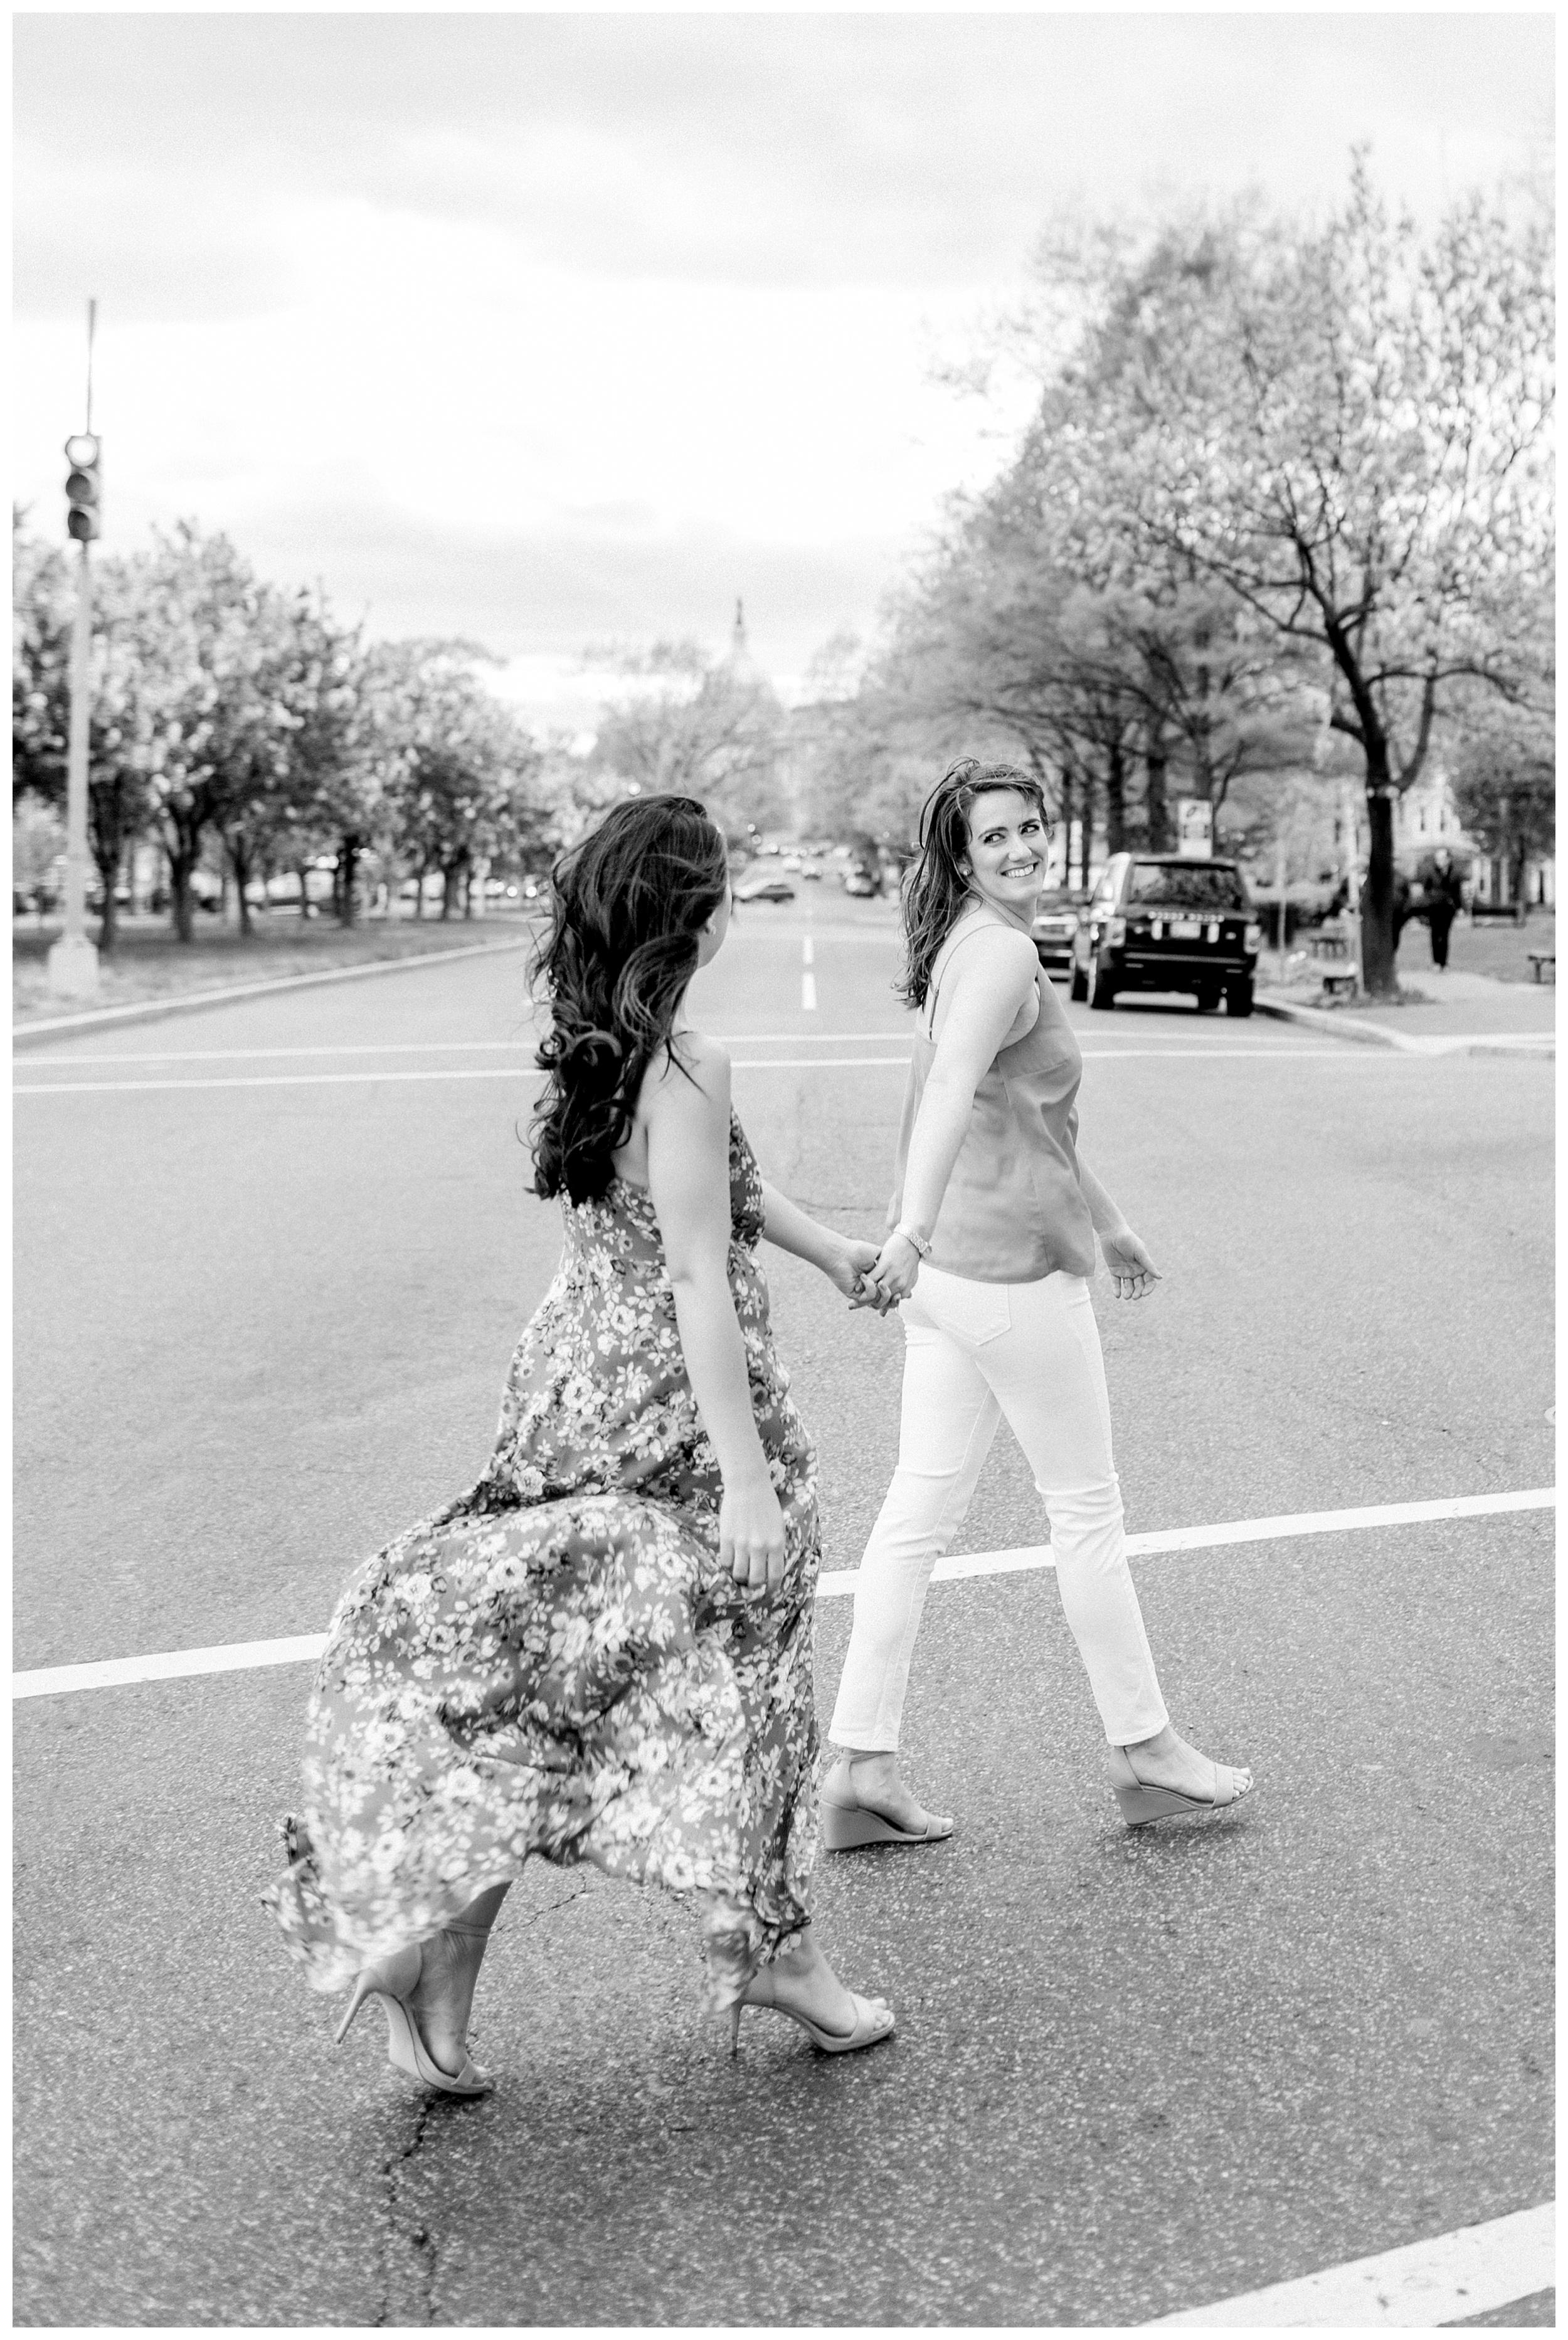 Same Sex DC Engagement | District of Columbia Wedding Photographer Kir Tuben_0007.jpg